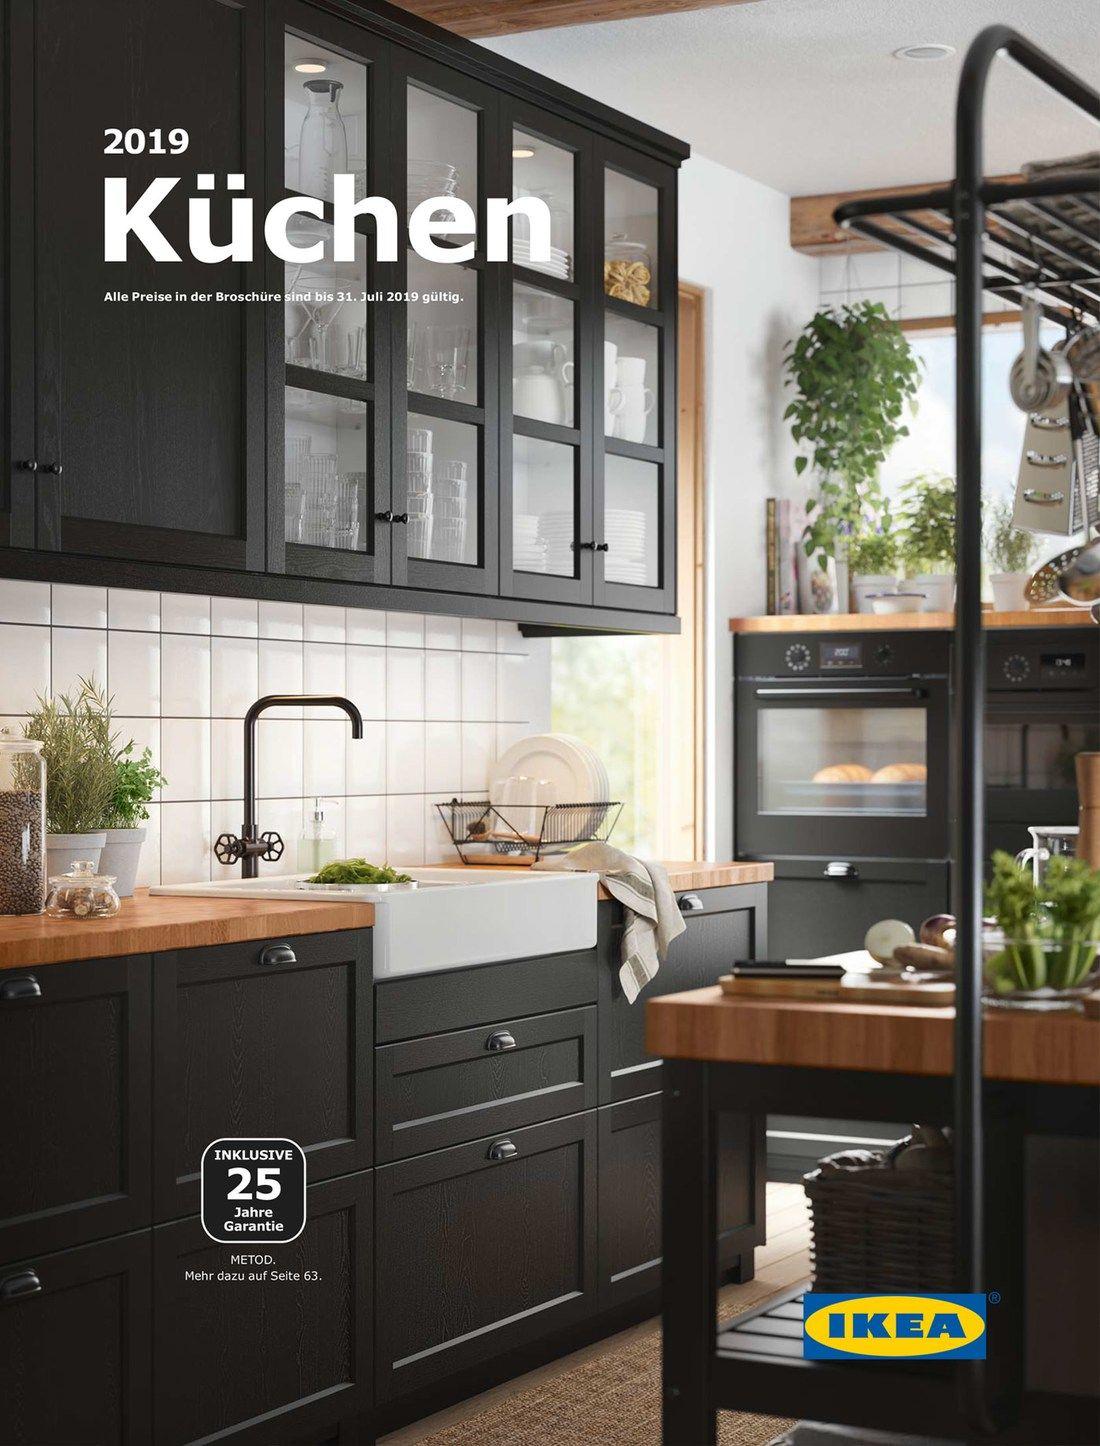 Full Size of Ikea Küche Katalog Fr 2020 Kchen Design Bodenbeläge Raffrollo Outdoor Edelstahl Doppel Mülleimer Eckküche Mit Elektrogeräten Wandregal Keramik Waschbecken Wohnzimmer Ikea Küche